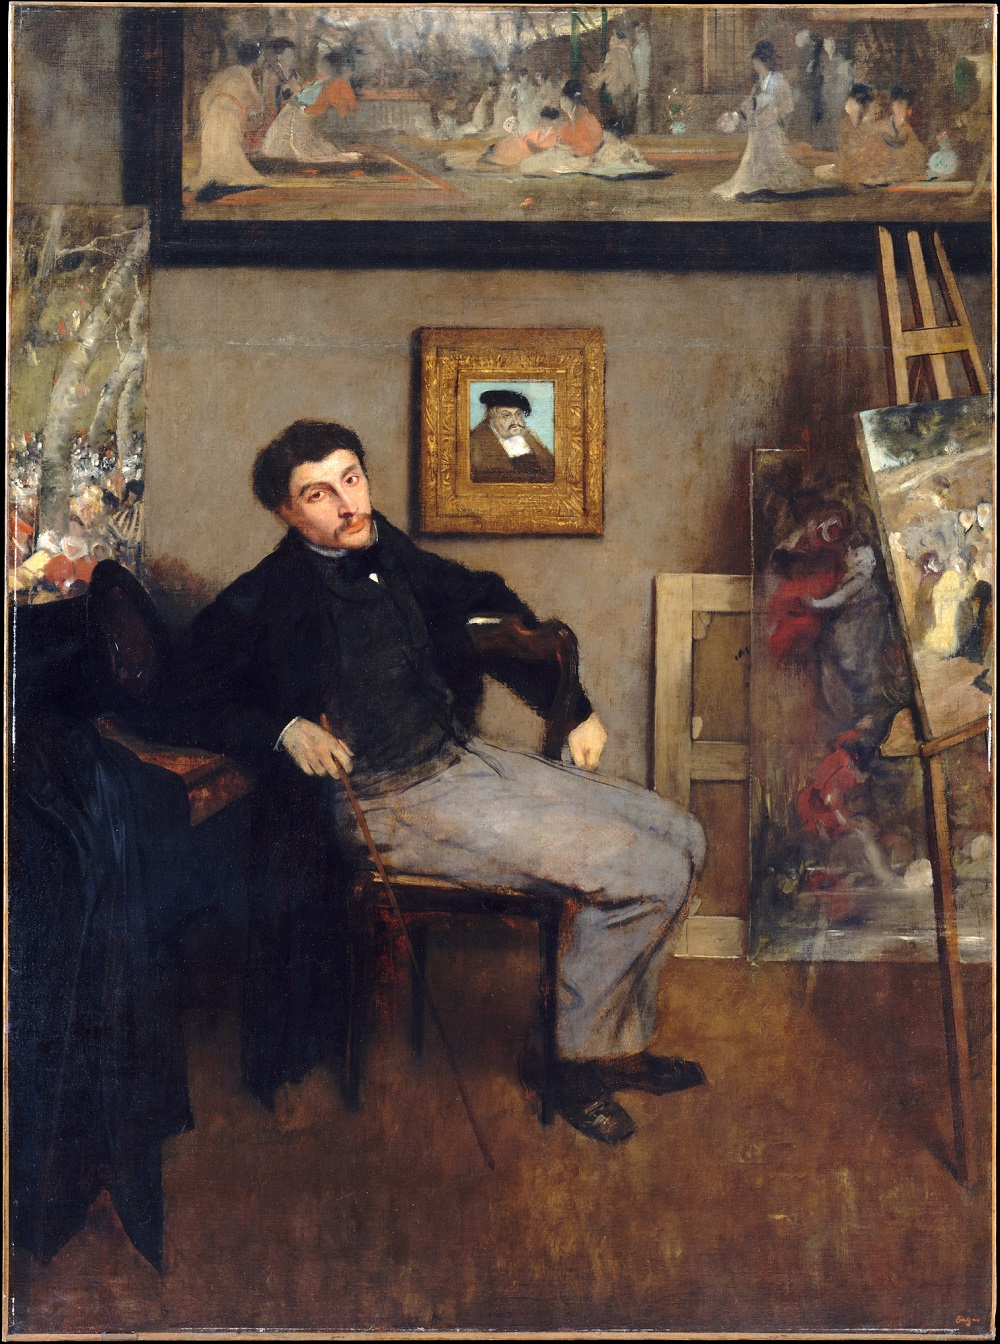 1 Edgar Degas (1834-1913)  Portrait of James Tissot oil on canvas 151.4 × 112 cm Metropolitan Museum of Art.jpg